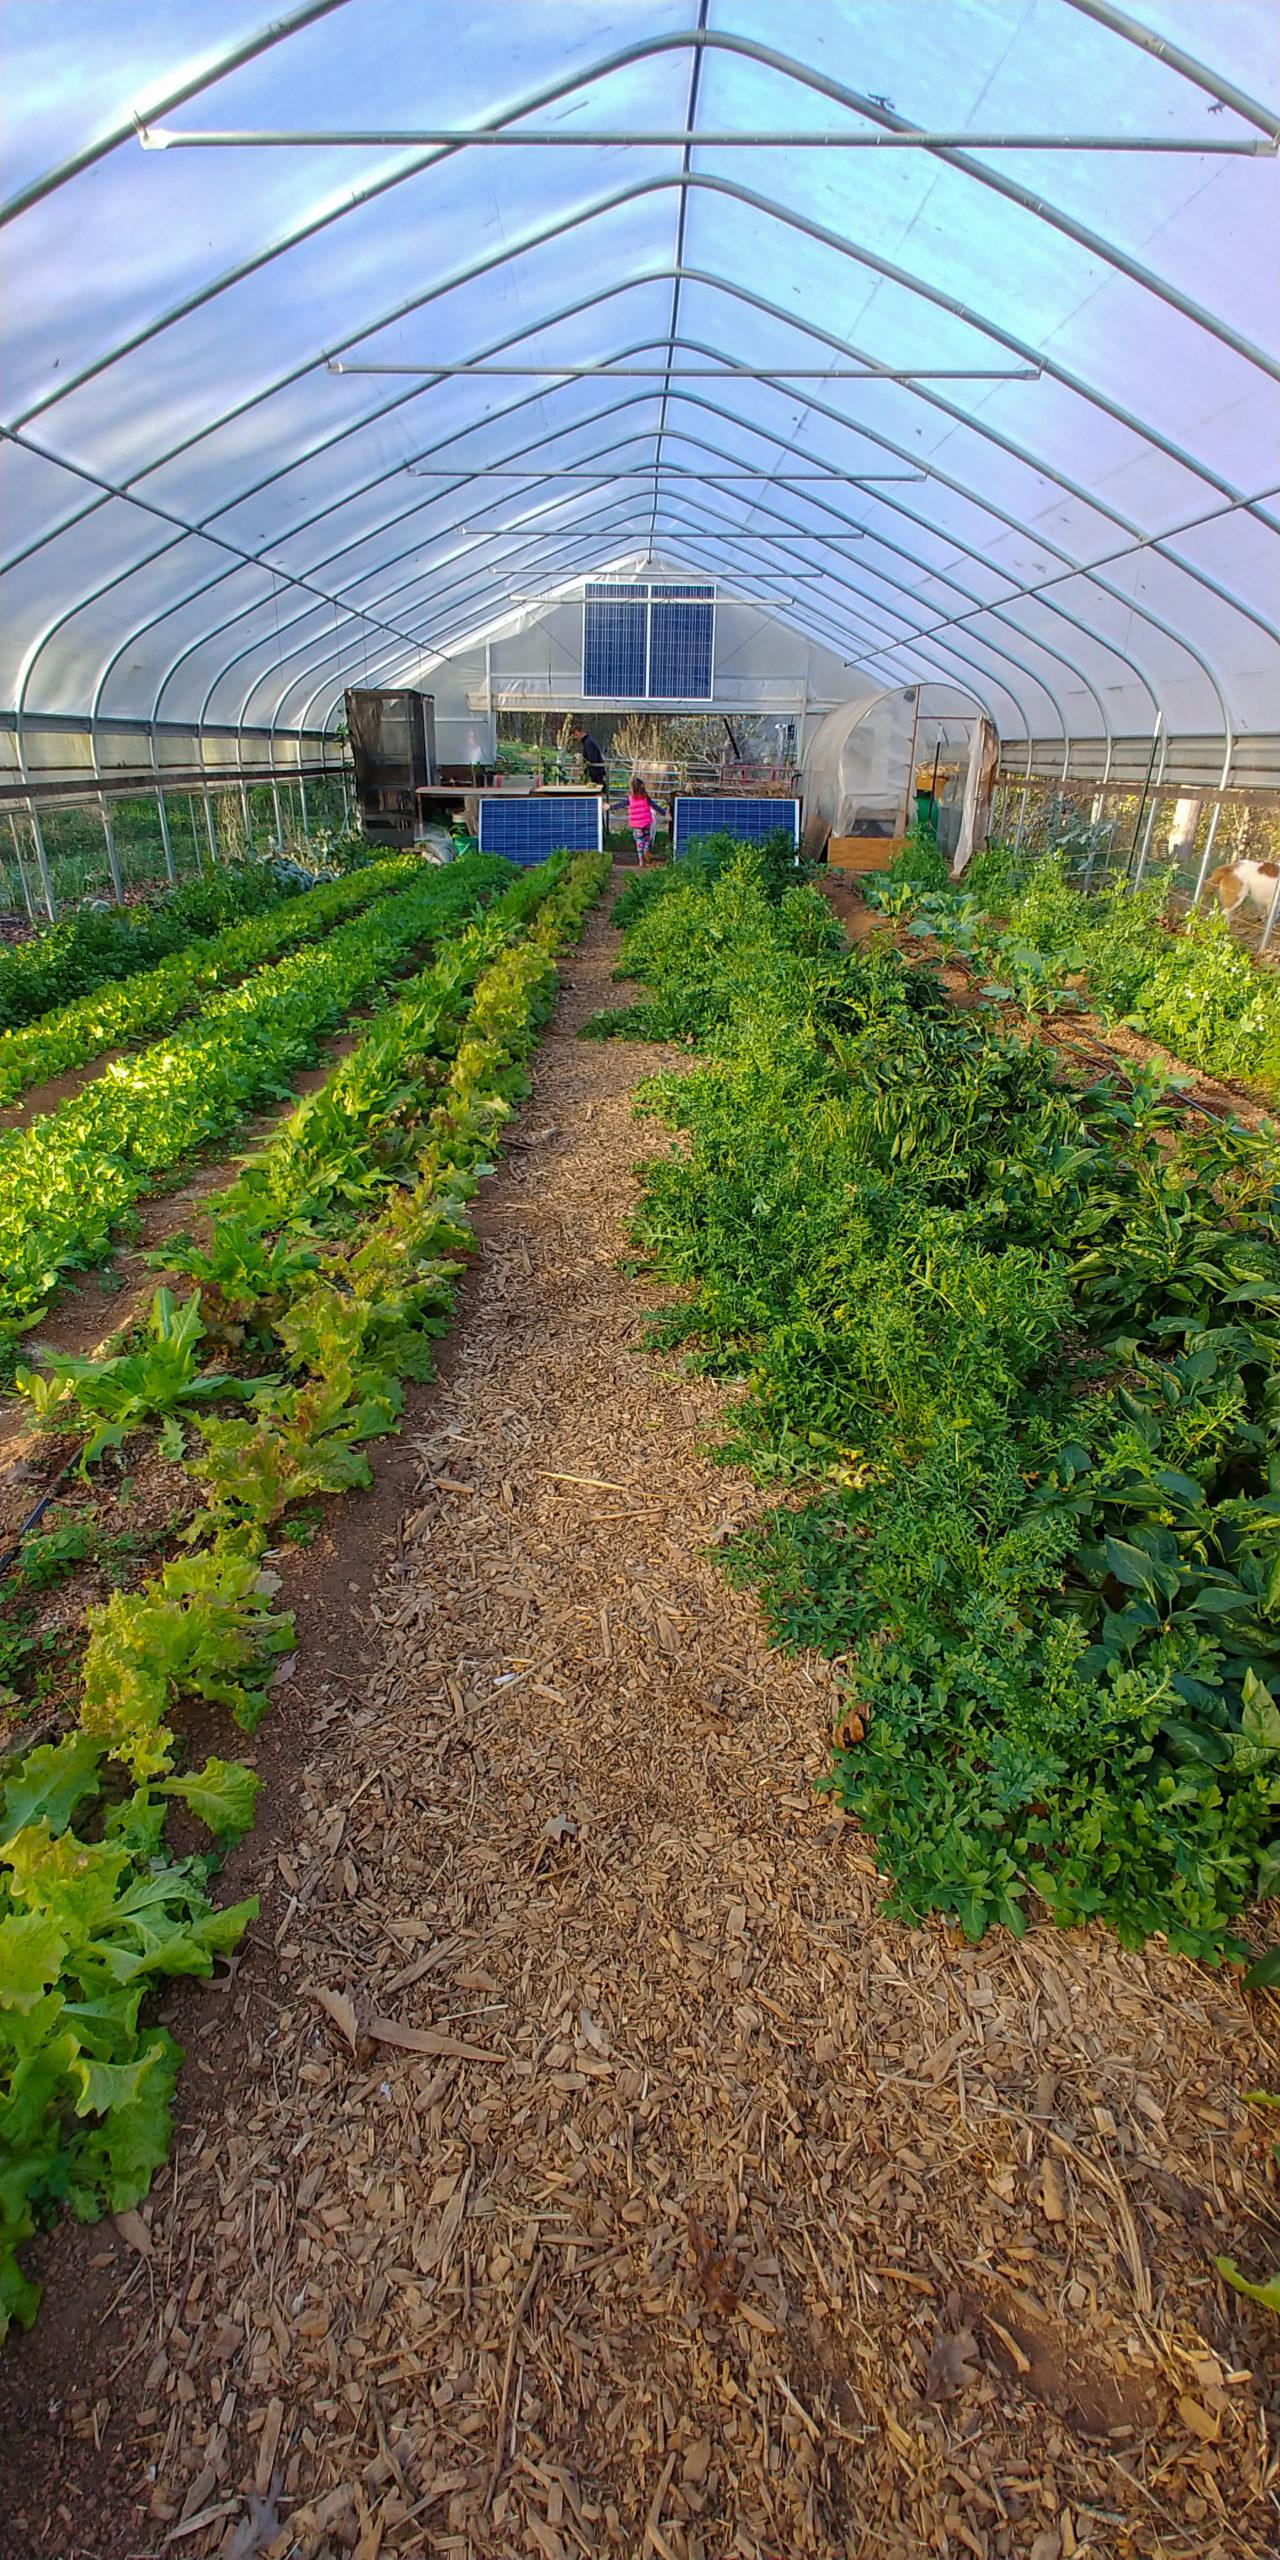 Humble Vine Farm, Cleveland GA